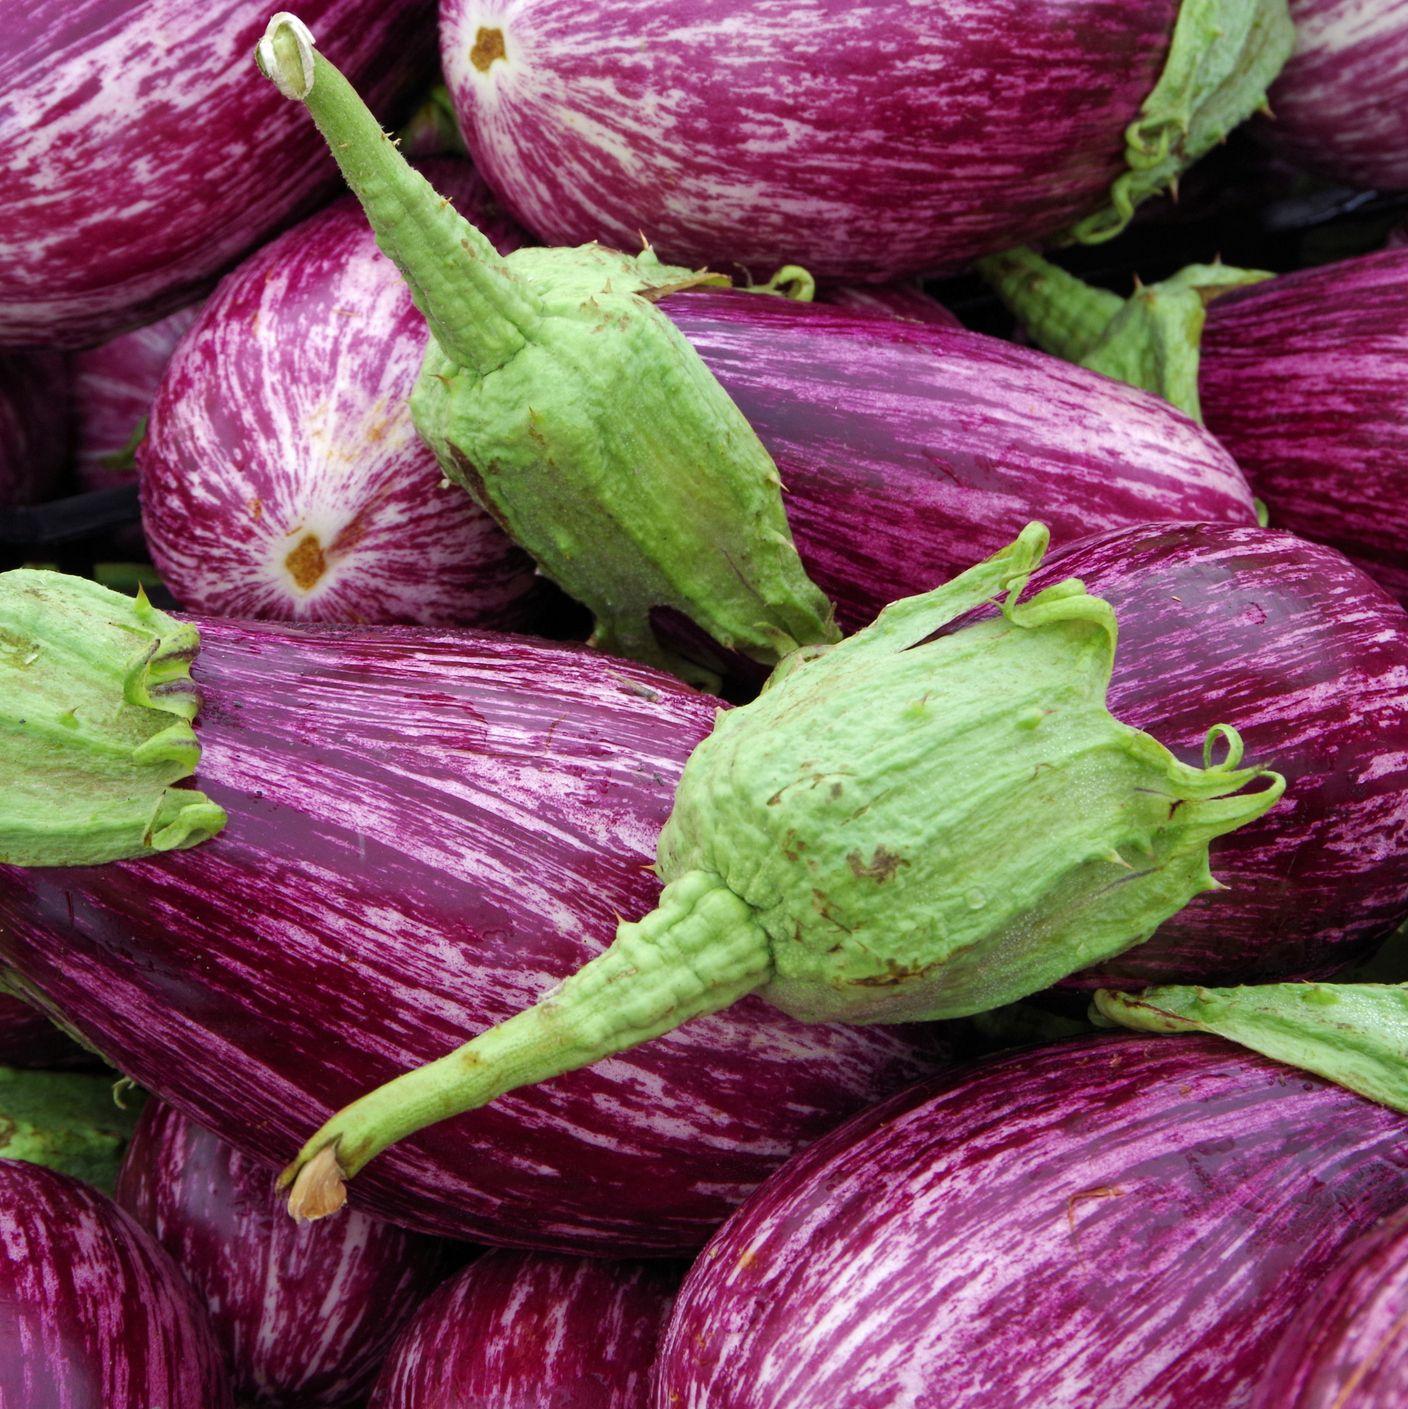 Purple with white streaks Sicilian eggplants